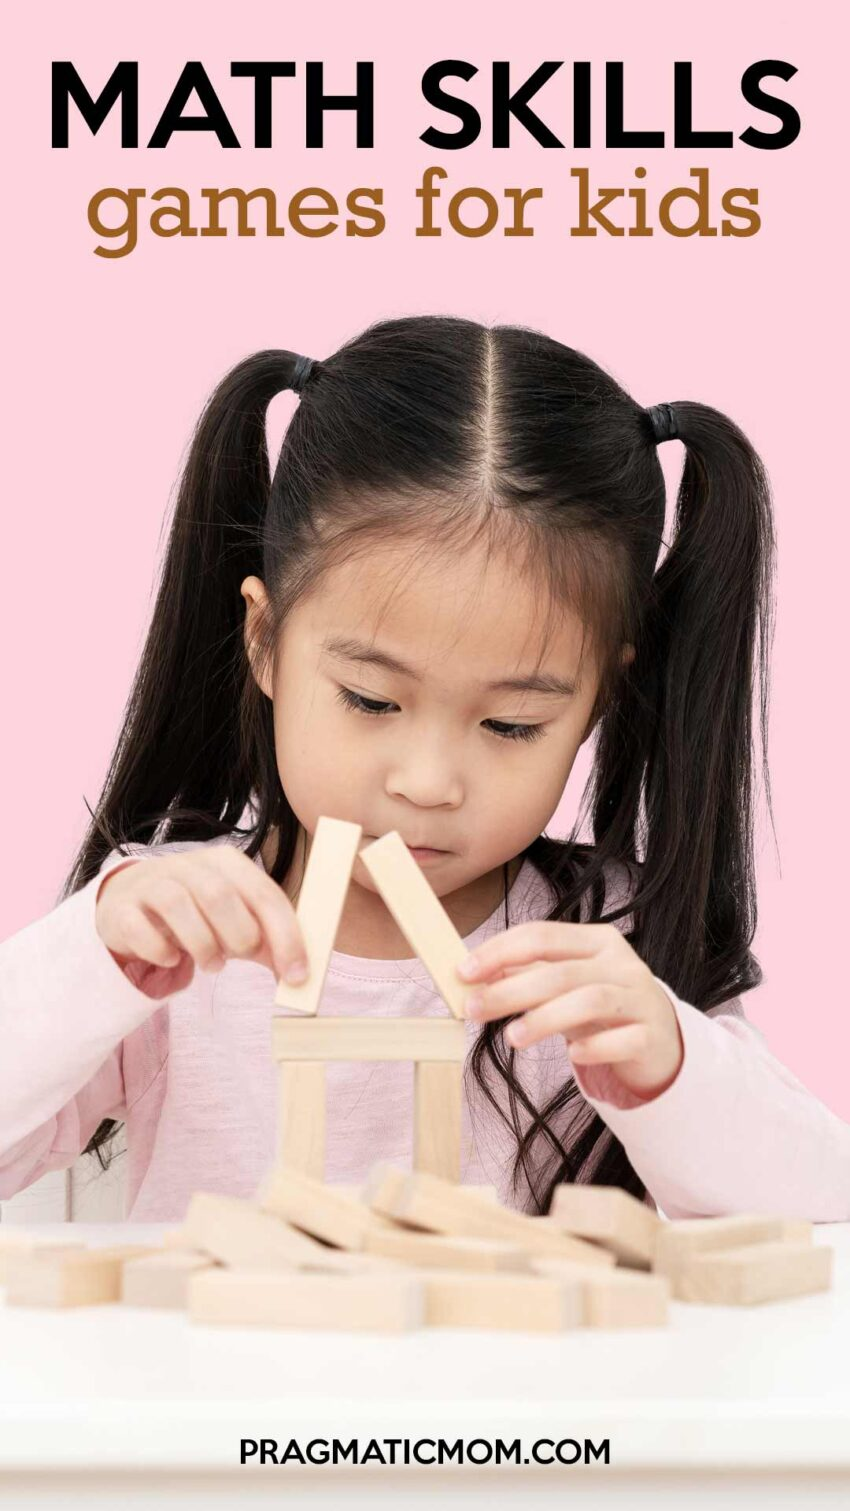 Math Skills Games for Kids